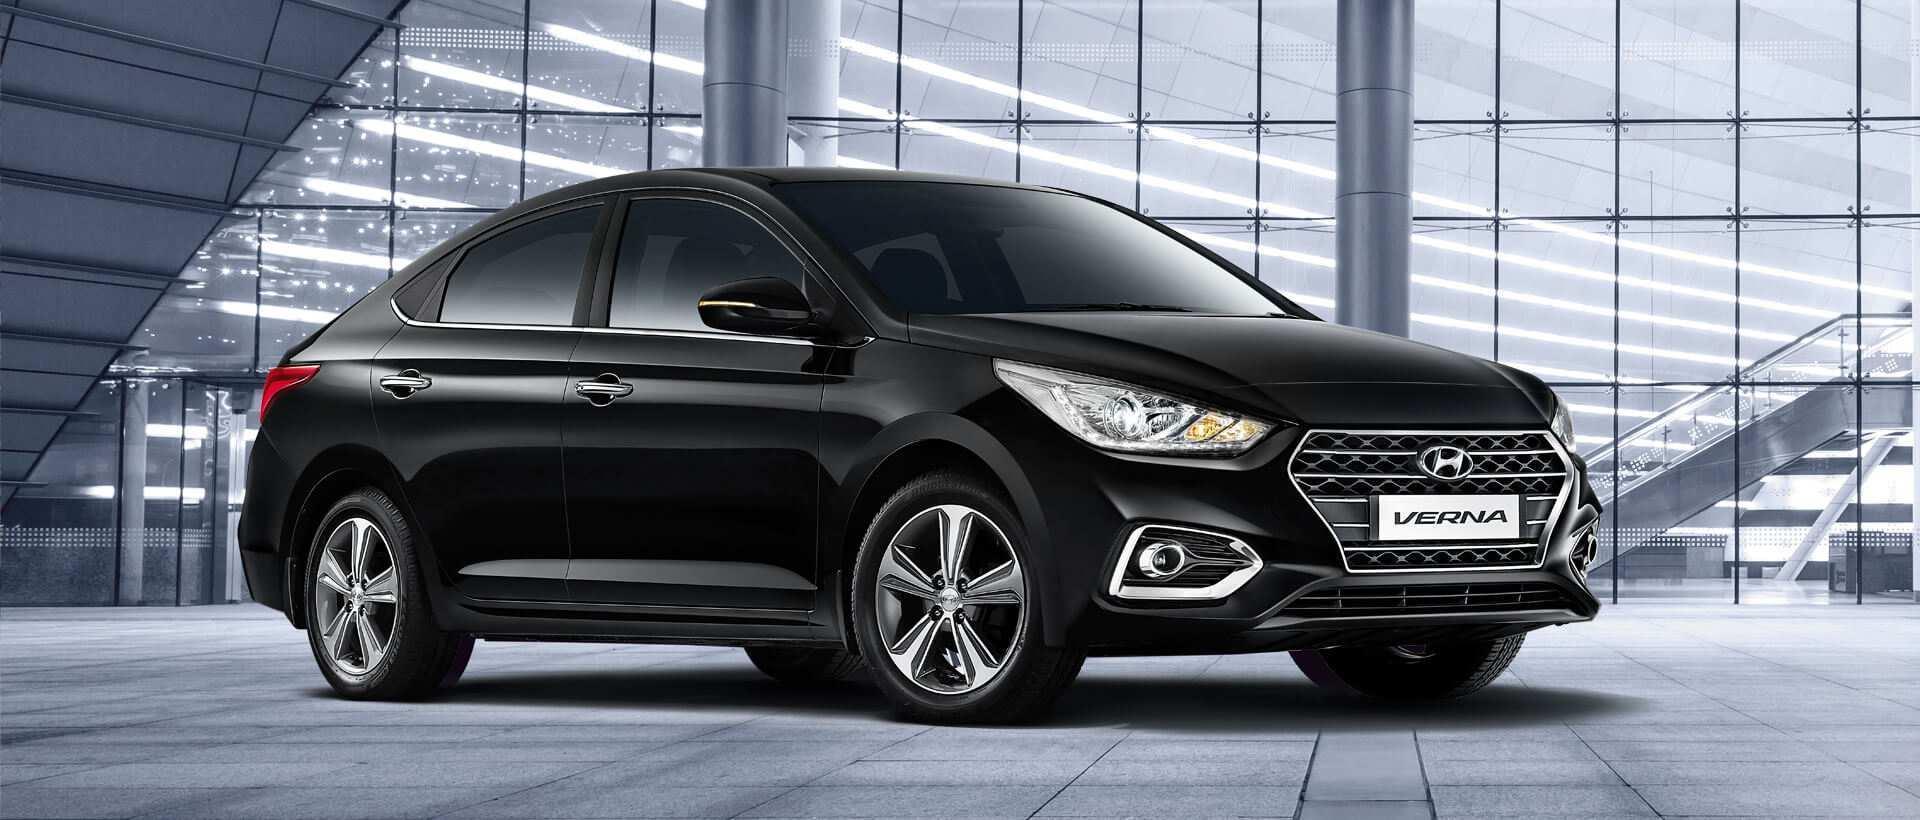 18 Great Hyundai Htv 2020 Redesign by Hyundai Htv 2020